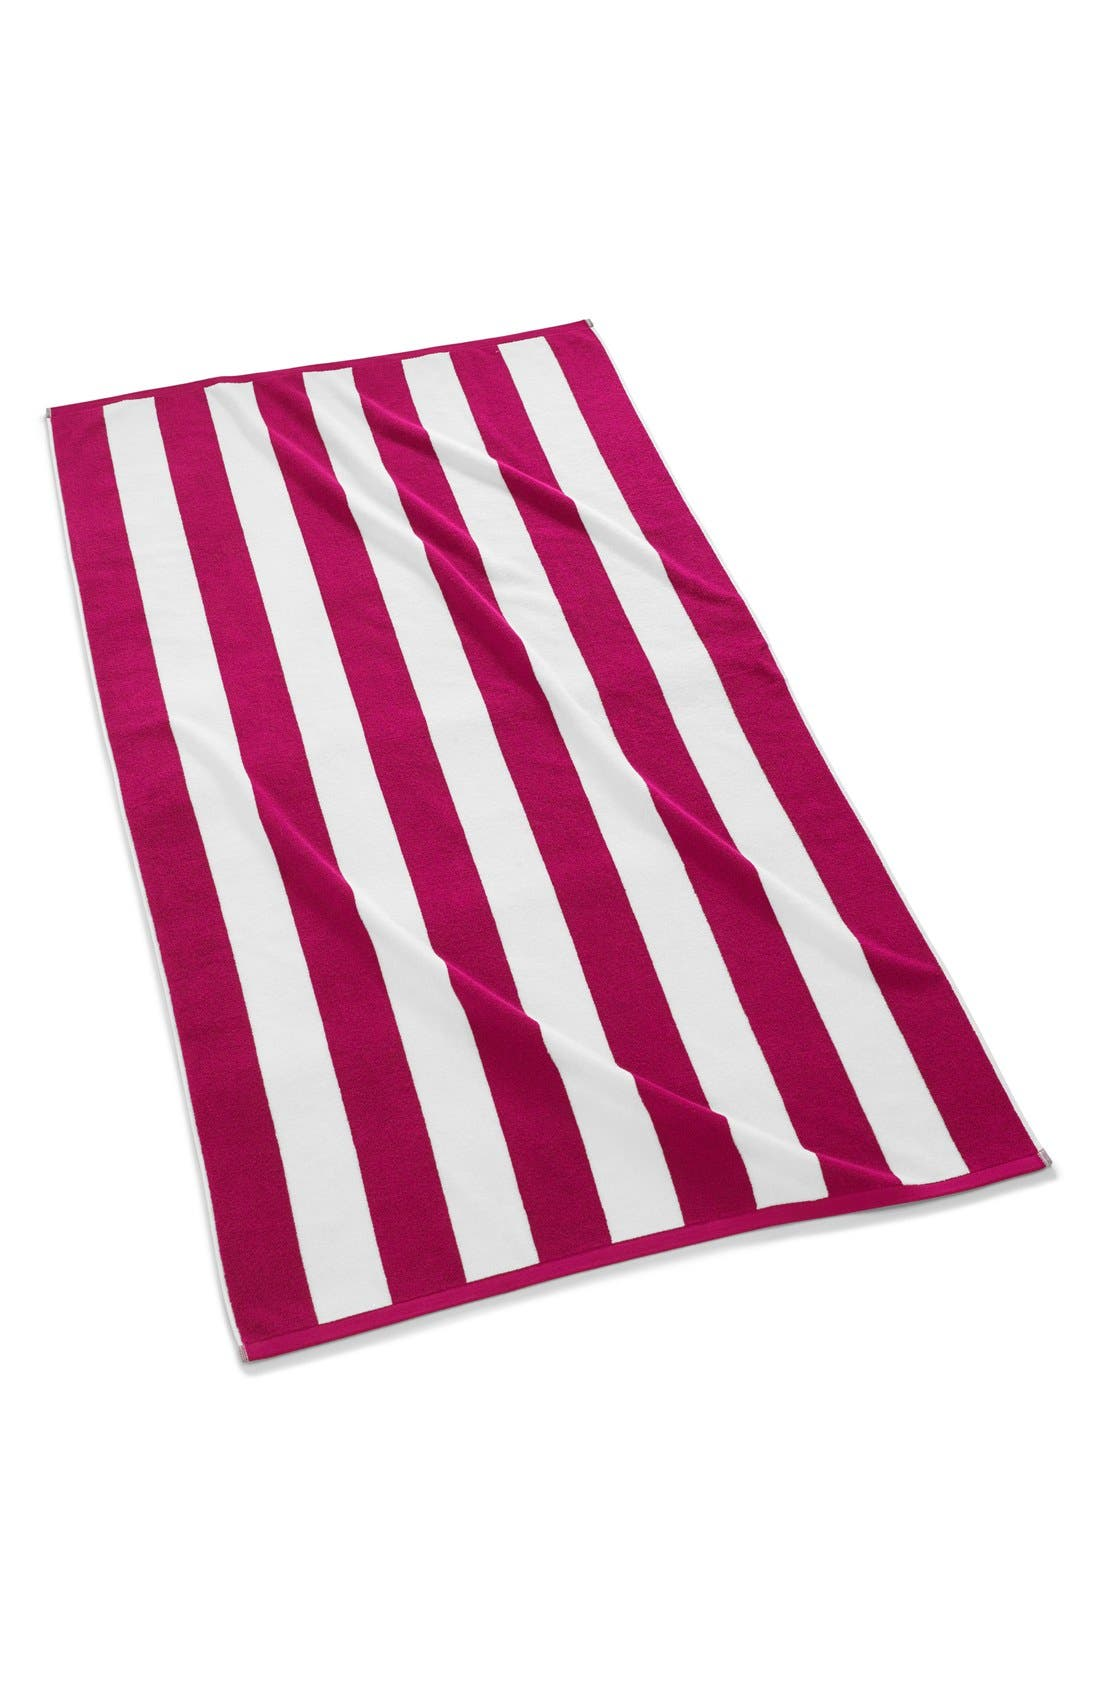 KASSATEX 'Cabana' Stripe Beach Towel, Main, color, 670